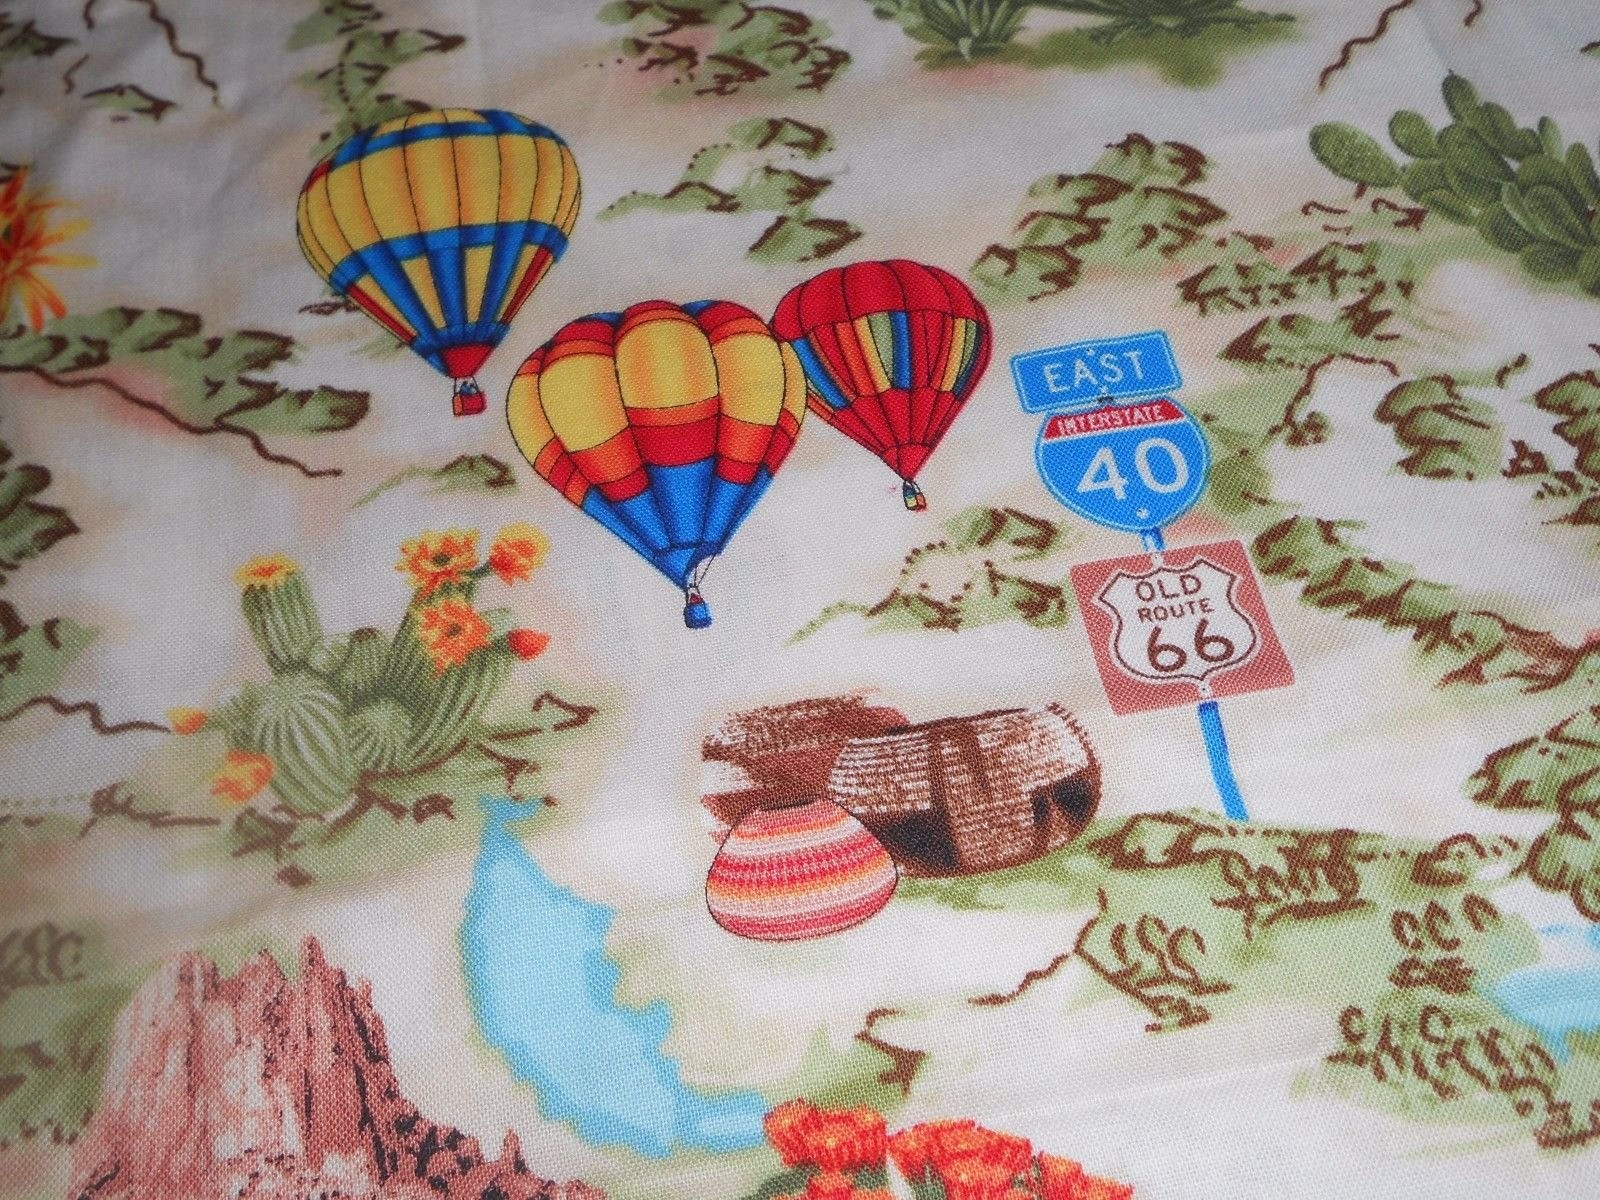 West Hot Air Balloon Travel